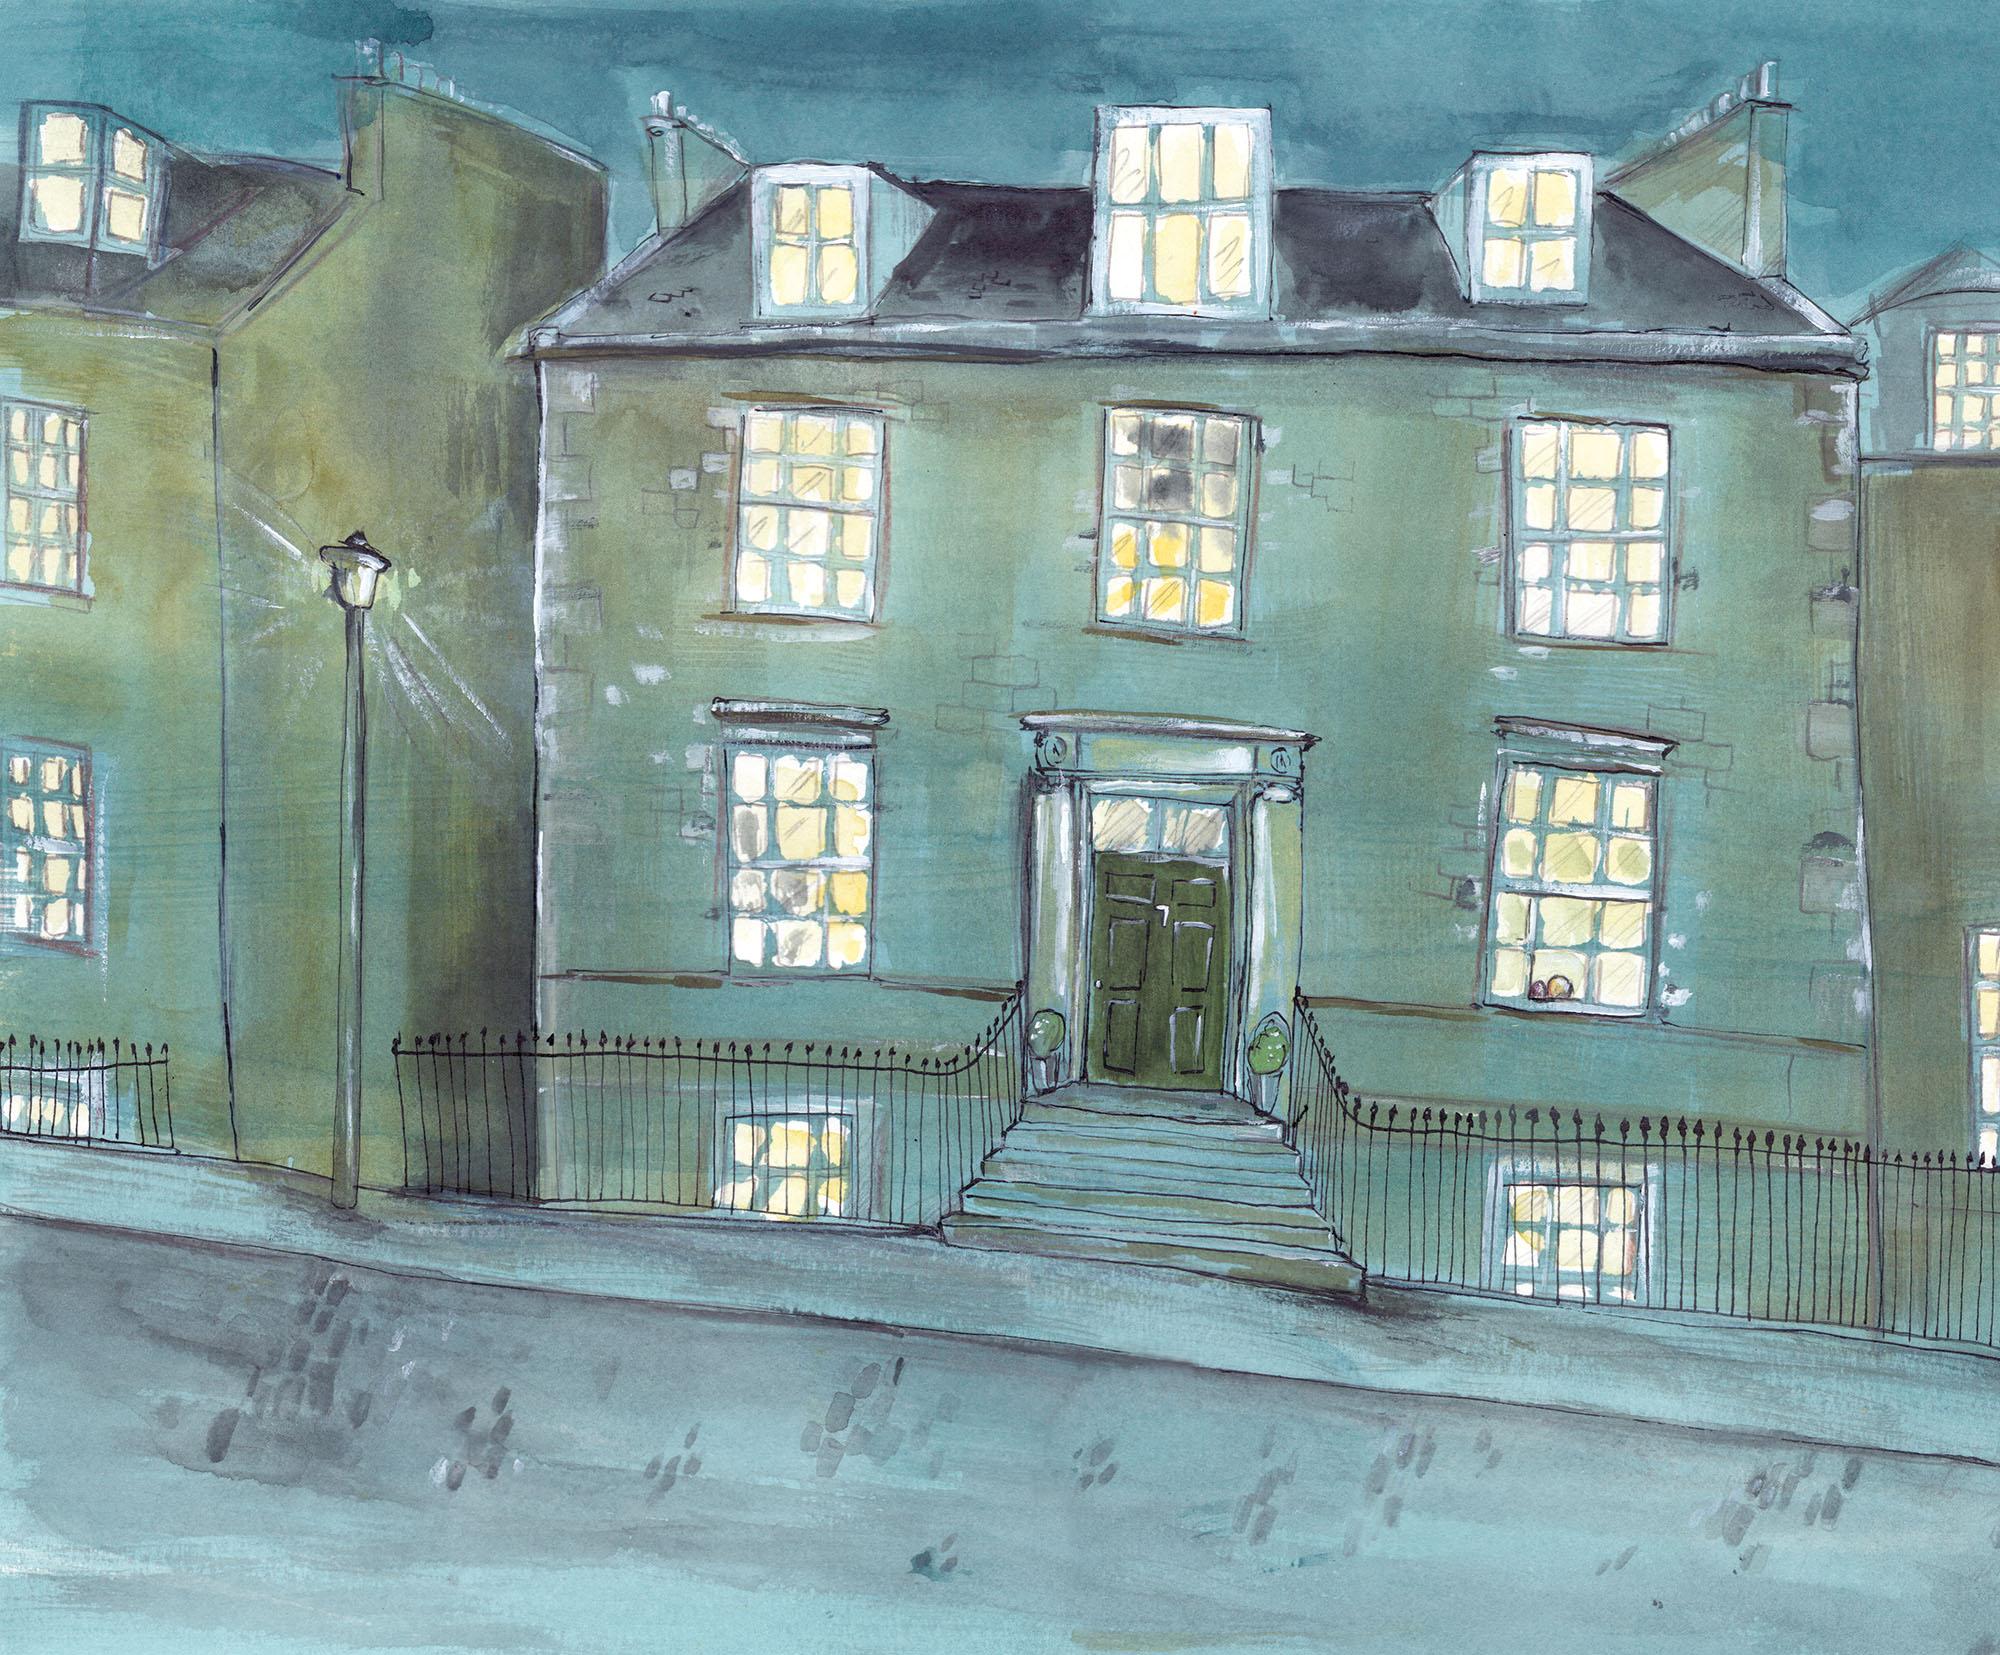 night time house illustration.jpg